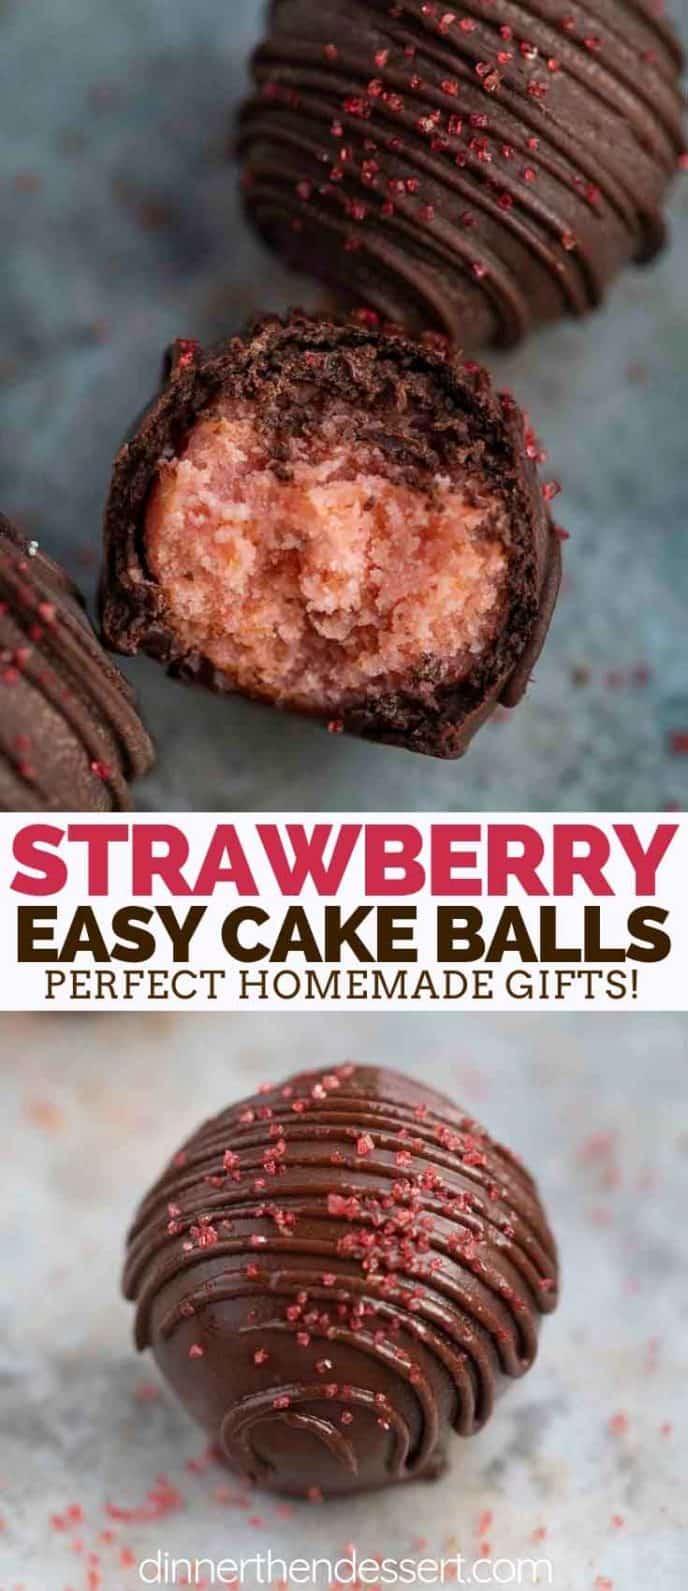 Chocolate Dipped Strawberry Cake Balls